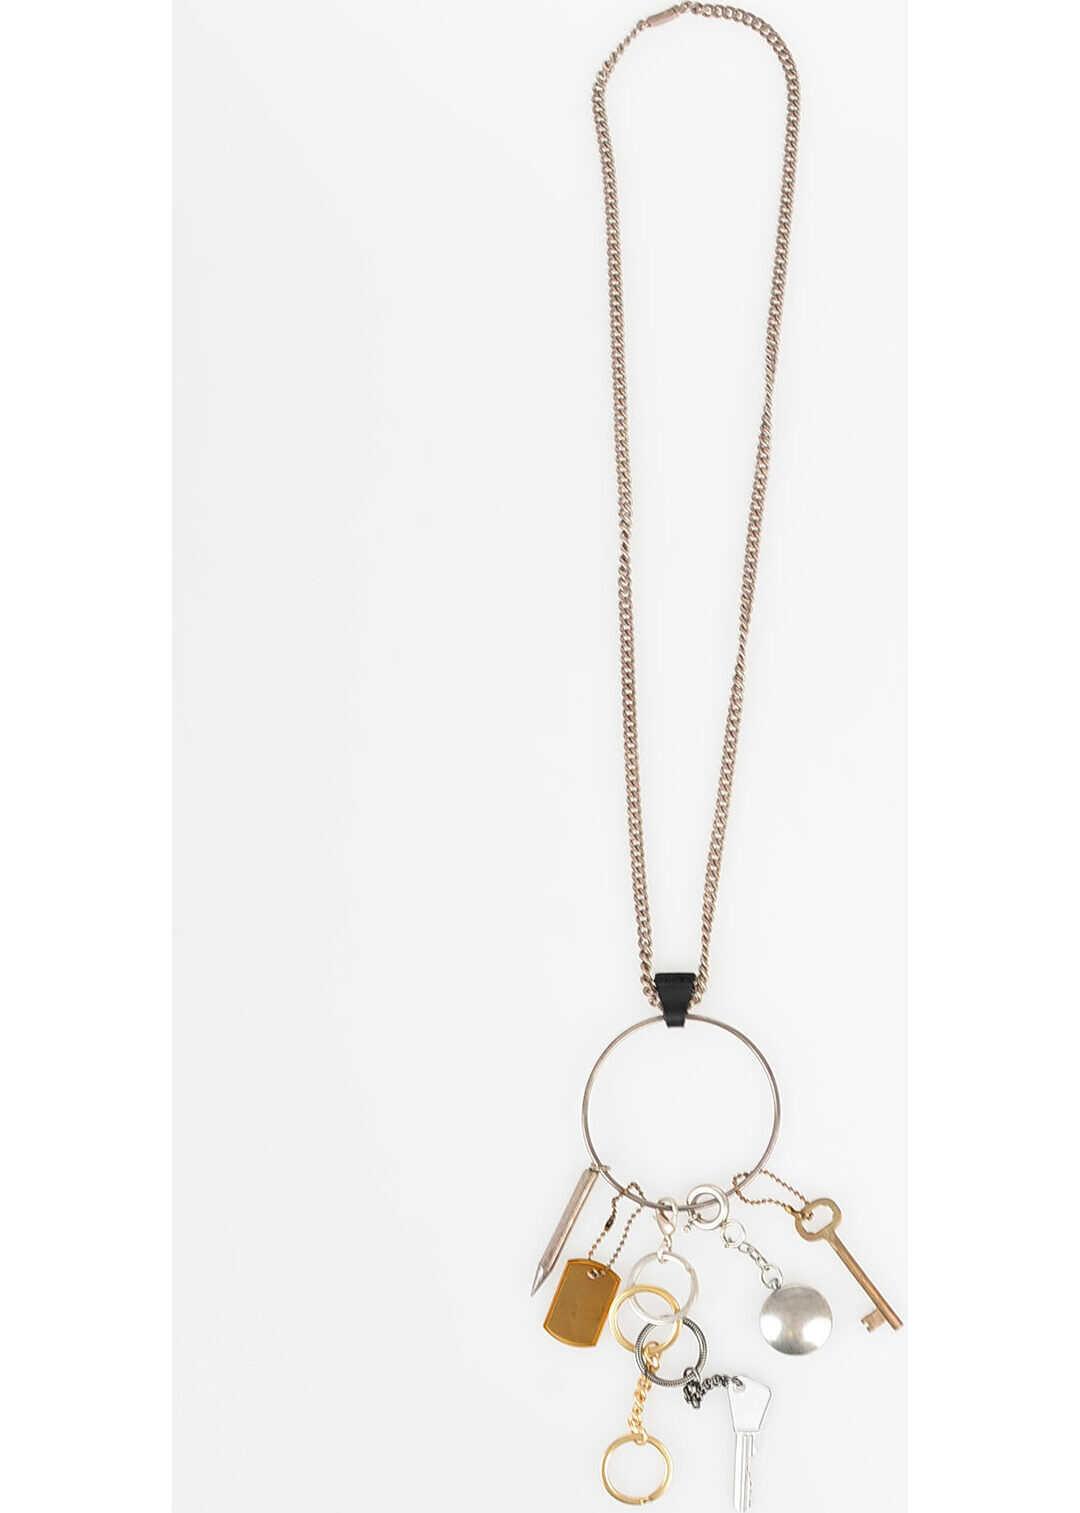 Maison Margiela MM11 Necklace Key SILVER